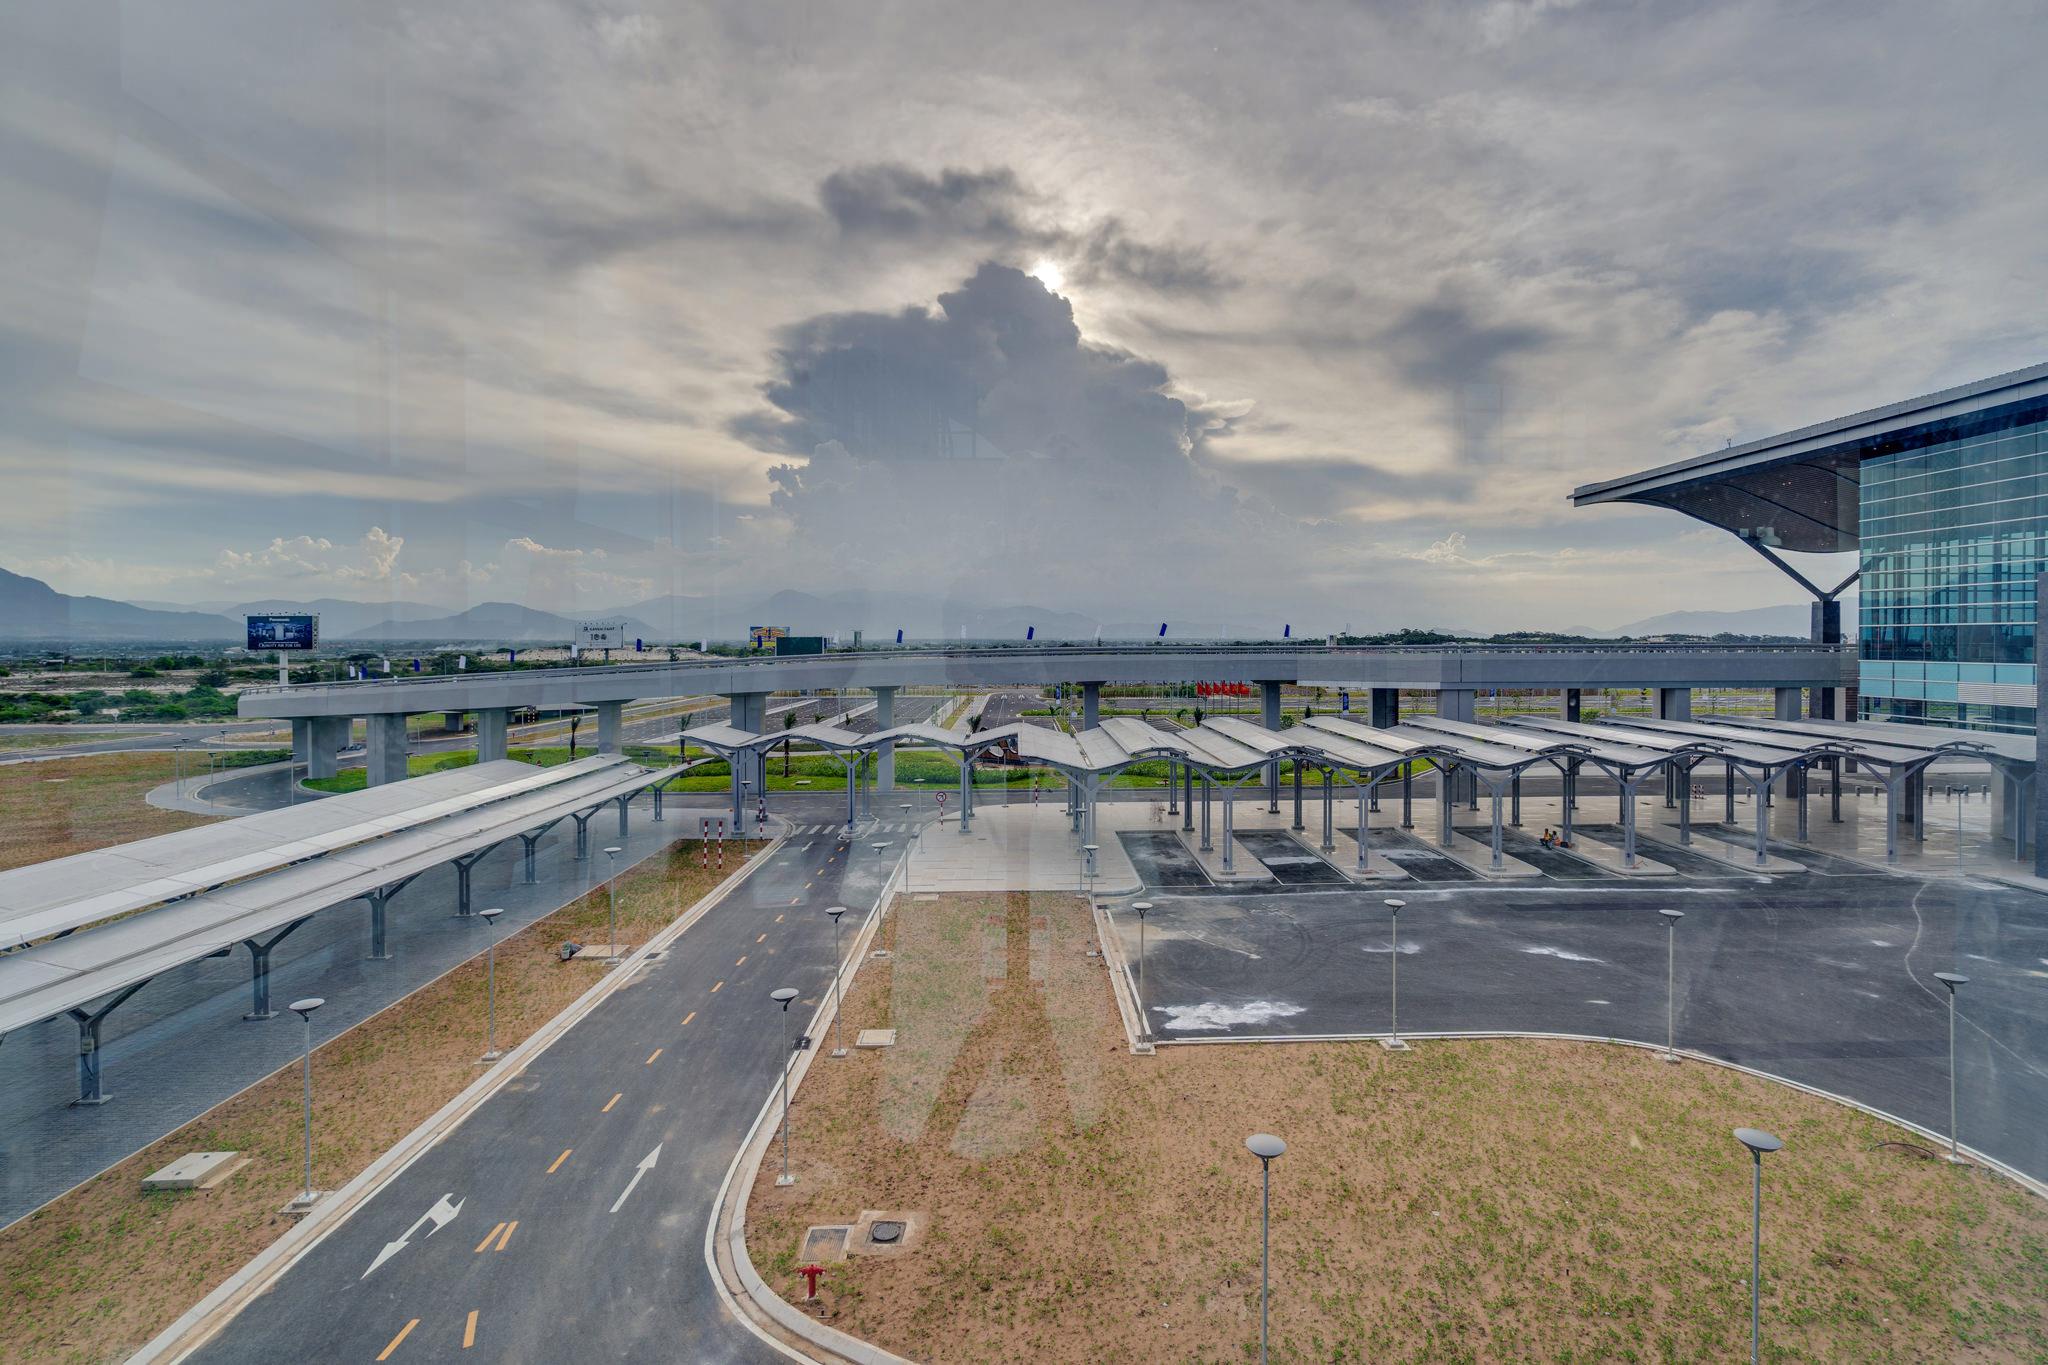 20180626 - Cam Ranh Airport - Architecture - 0349.jpg